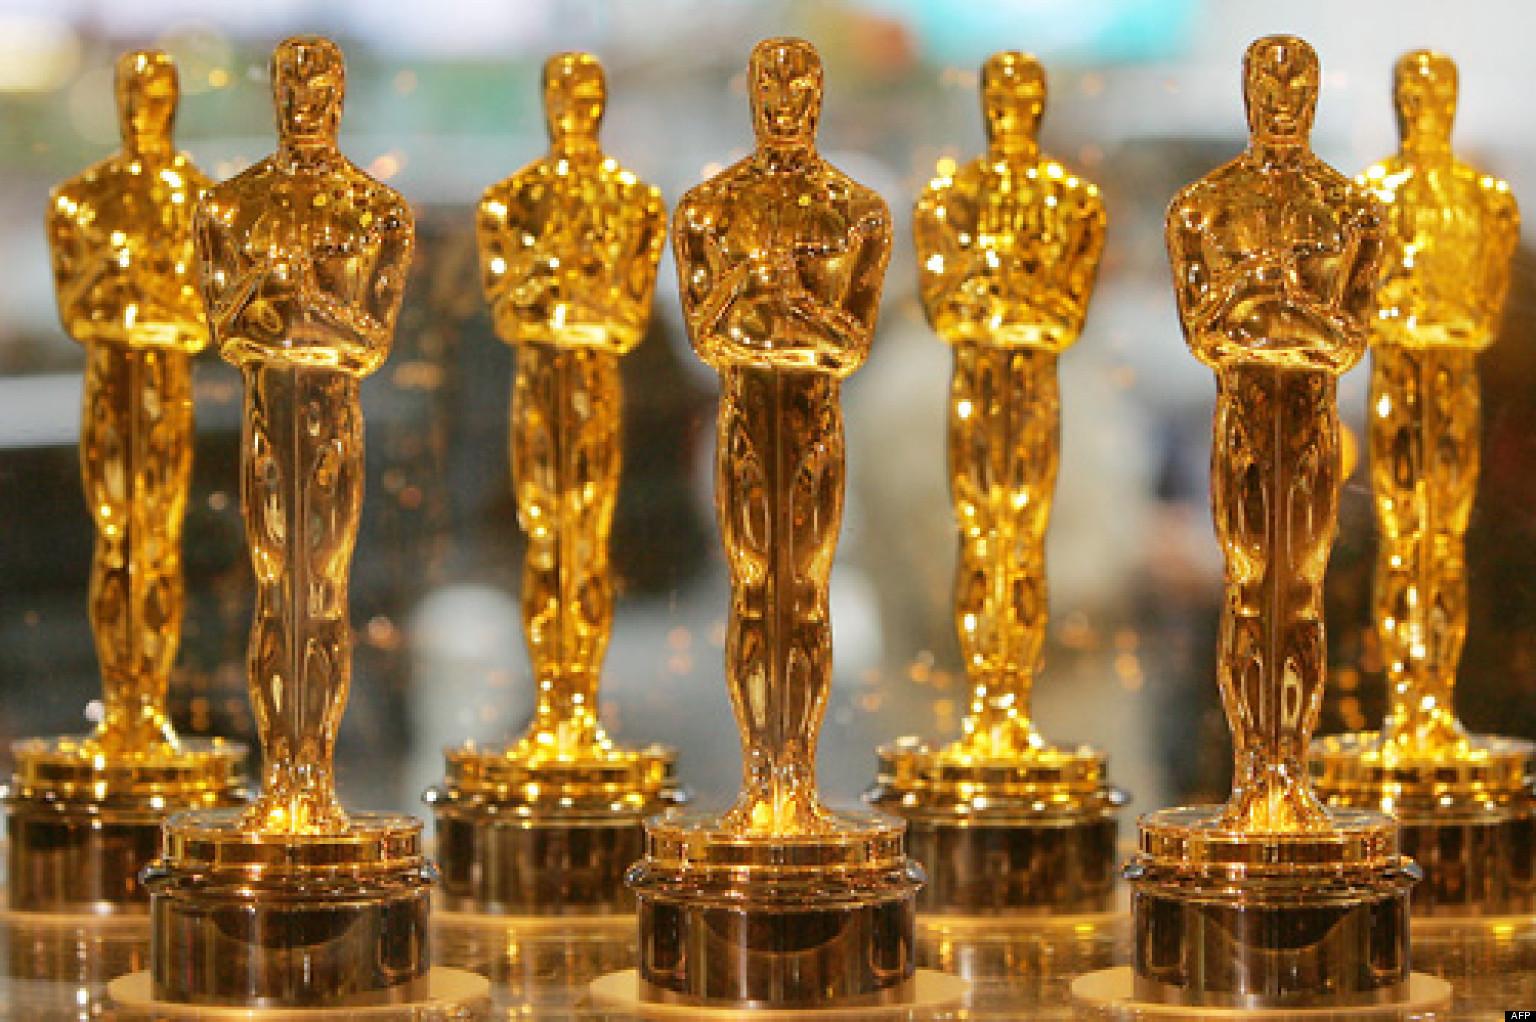 My Oscar Nomination Reactions